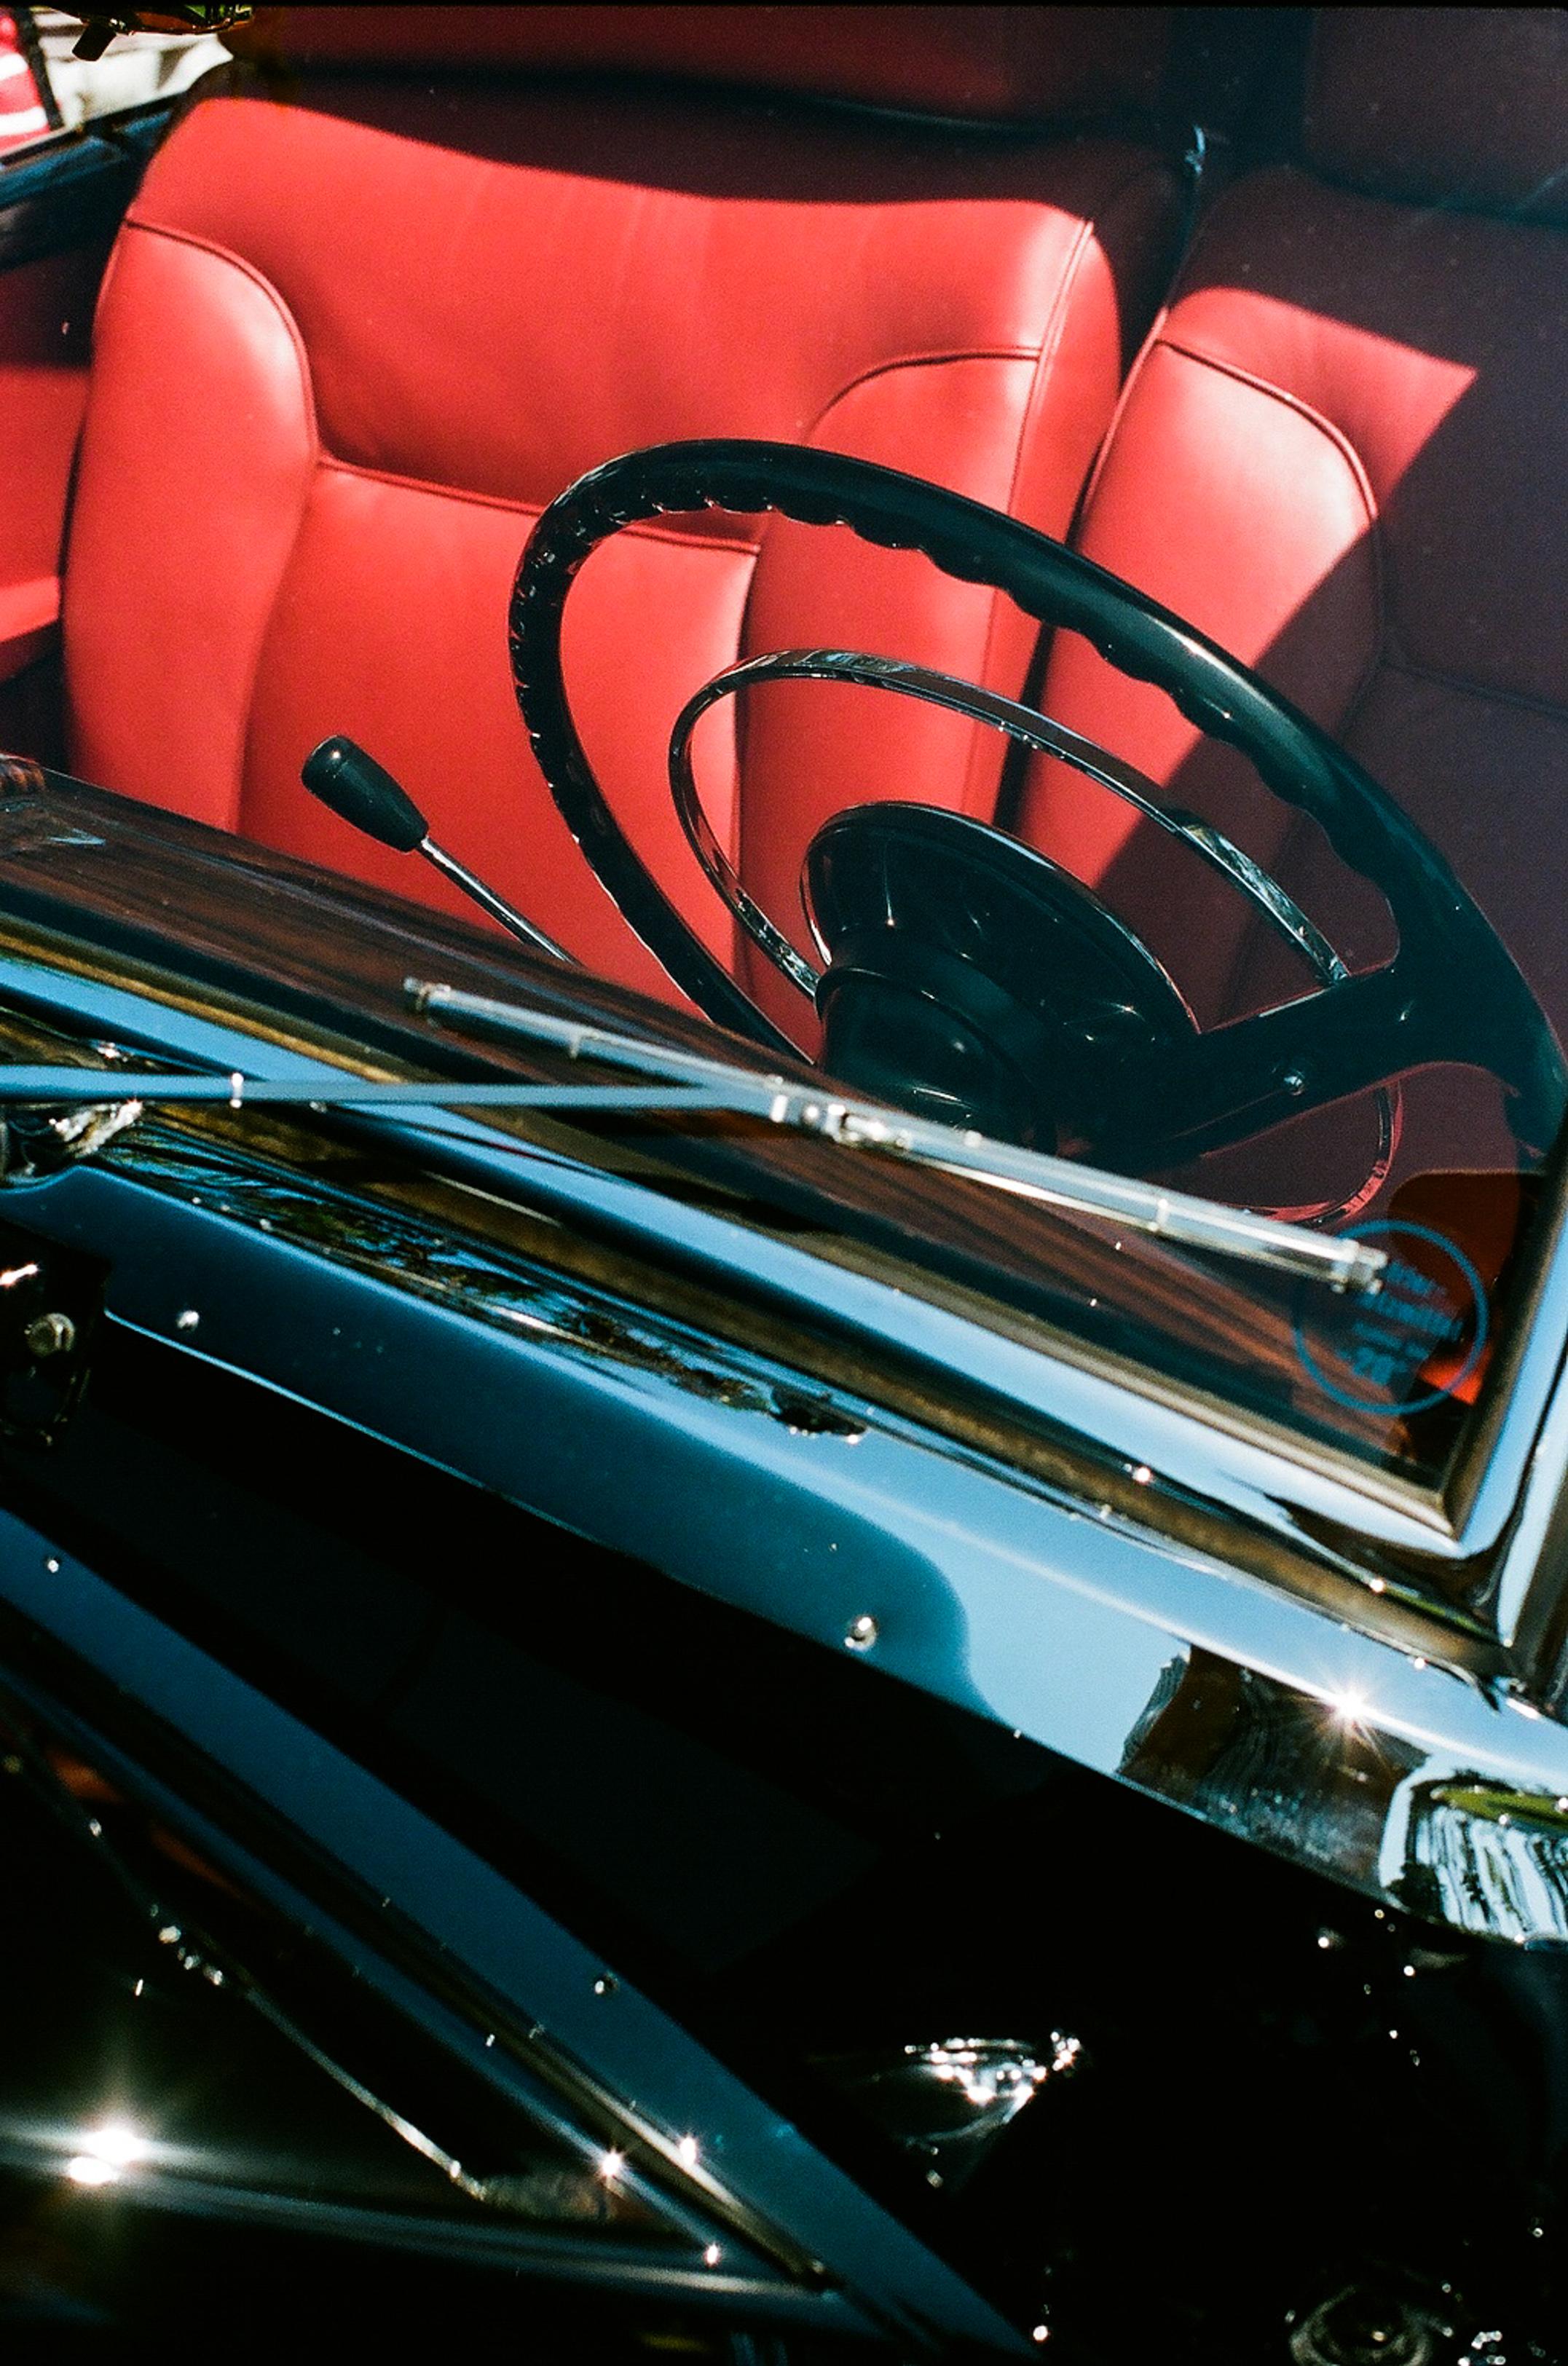 San Marino Motor Classic, film photography, neave bozorgi